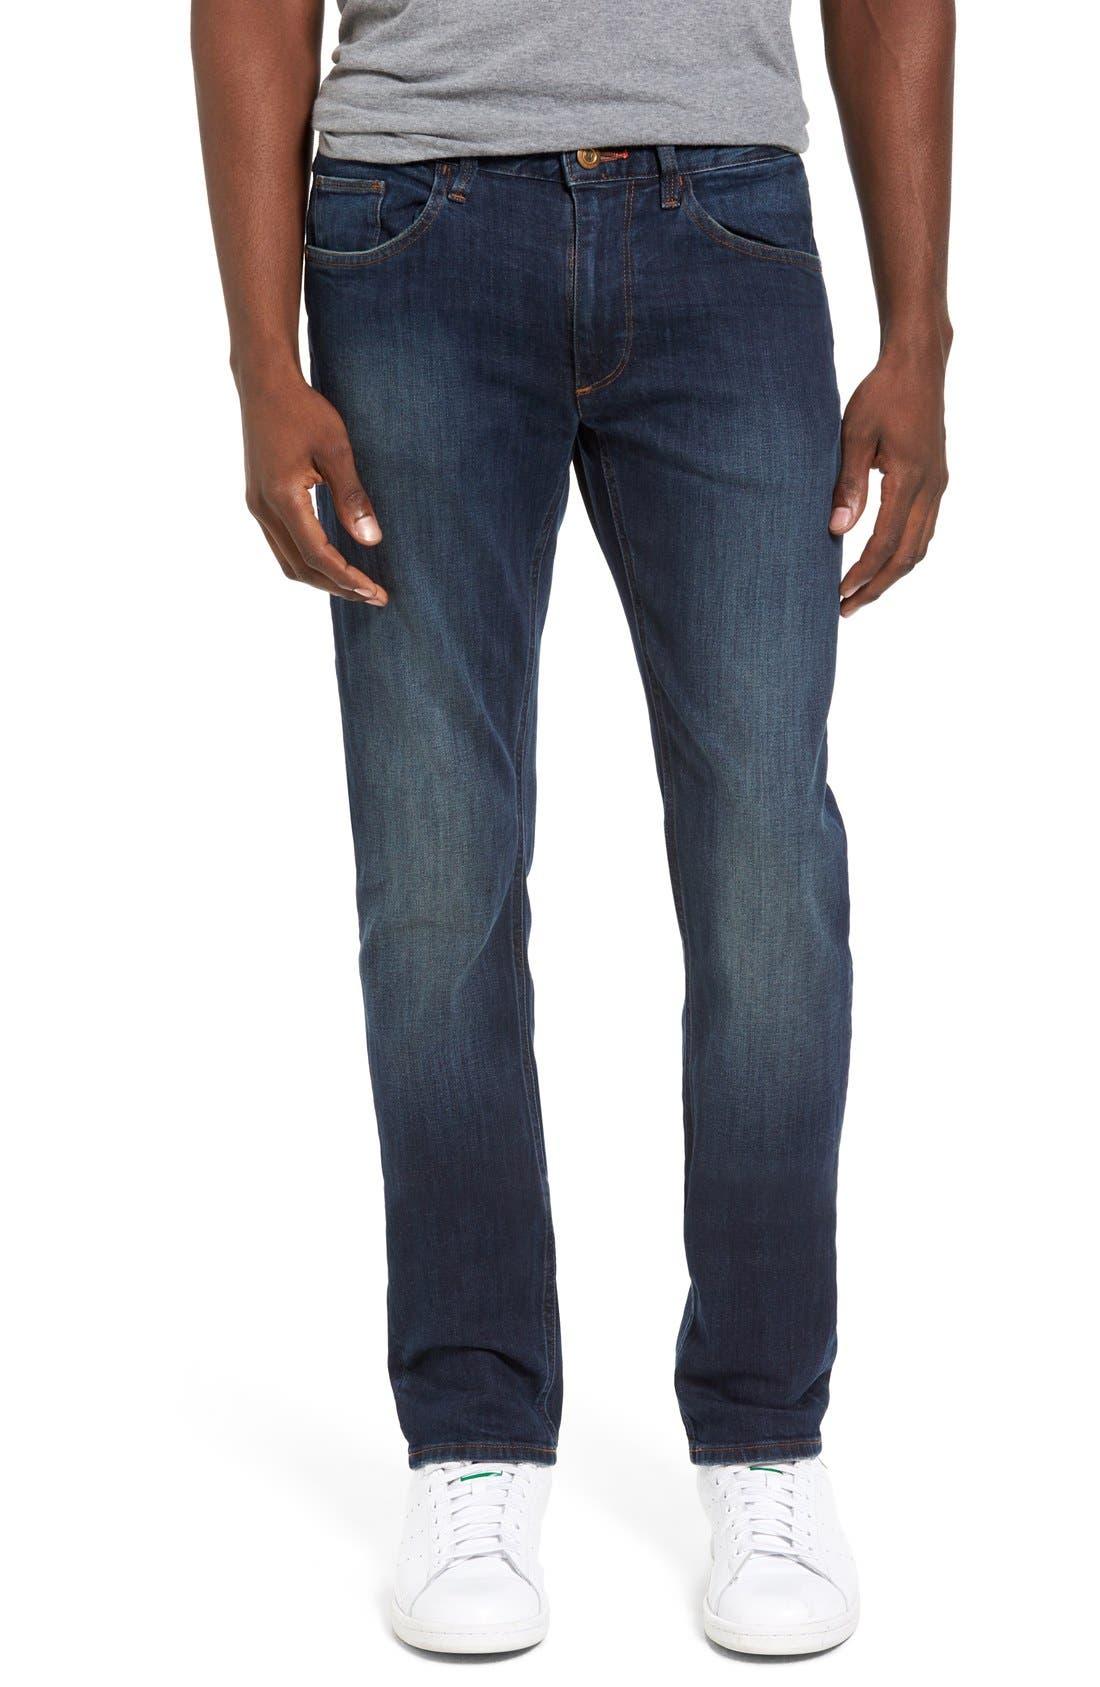 Alternate Image 1 Selected - Psycho Bunny Spitfire Slim Fit Jeans